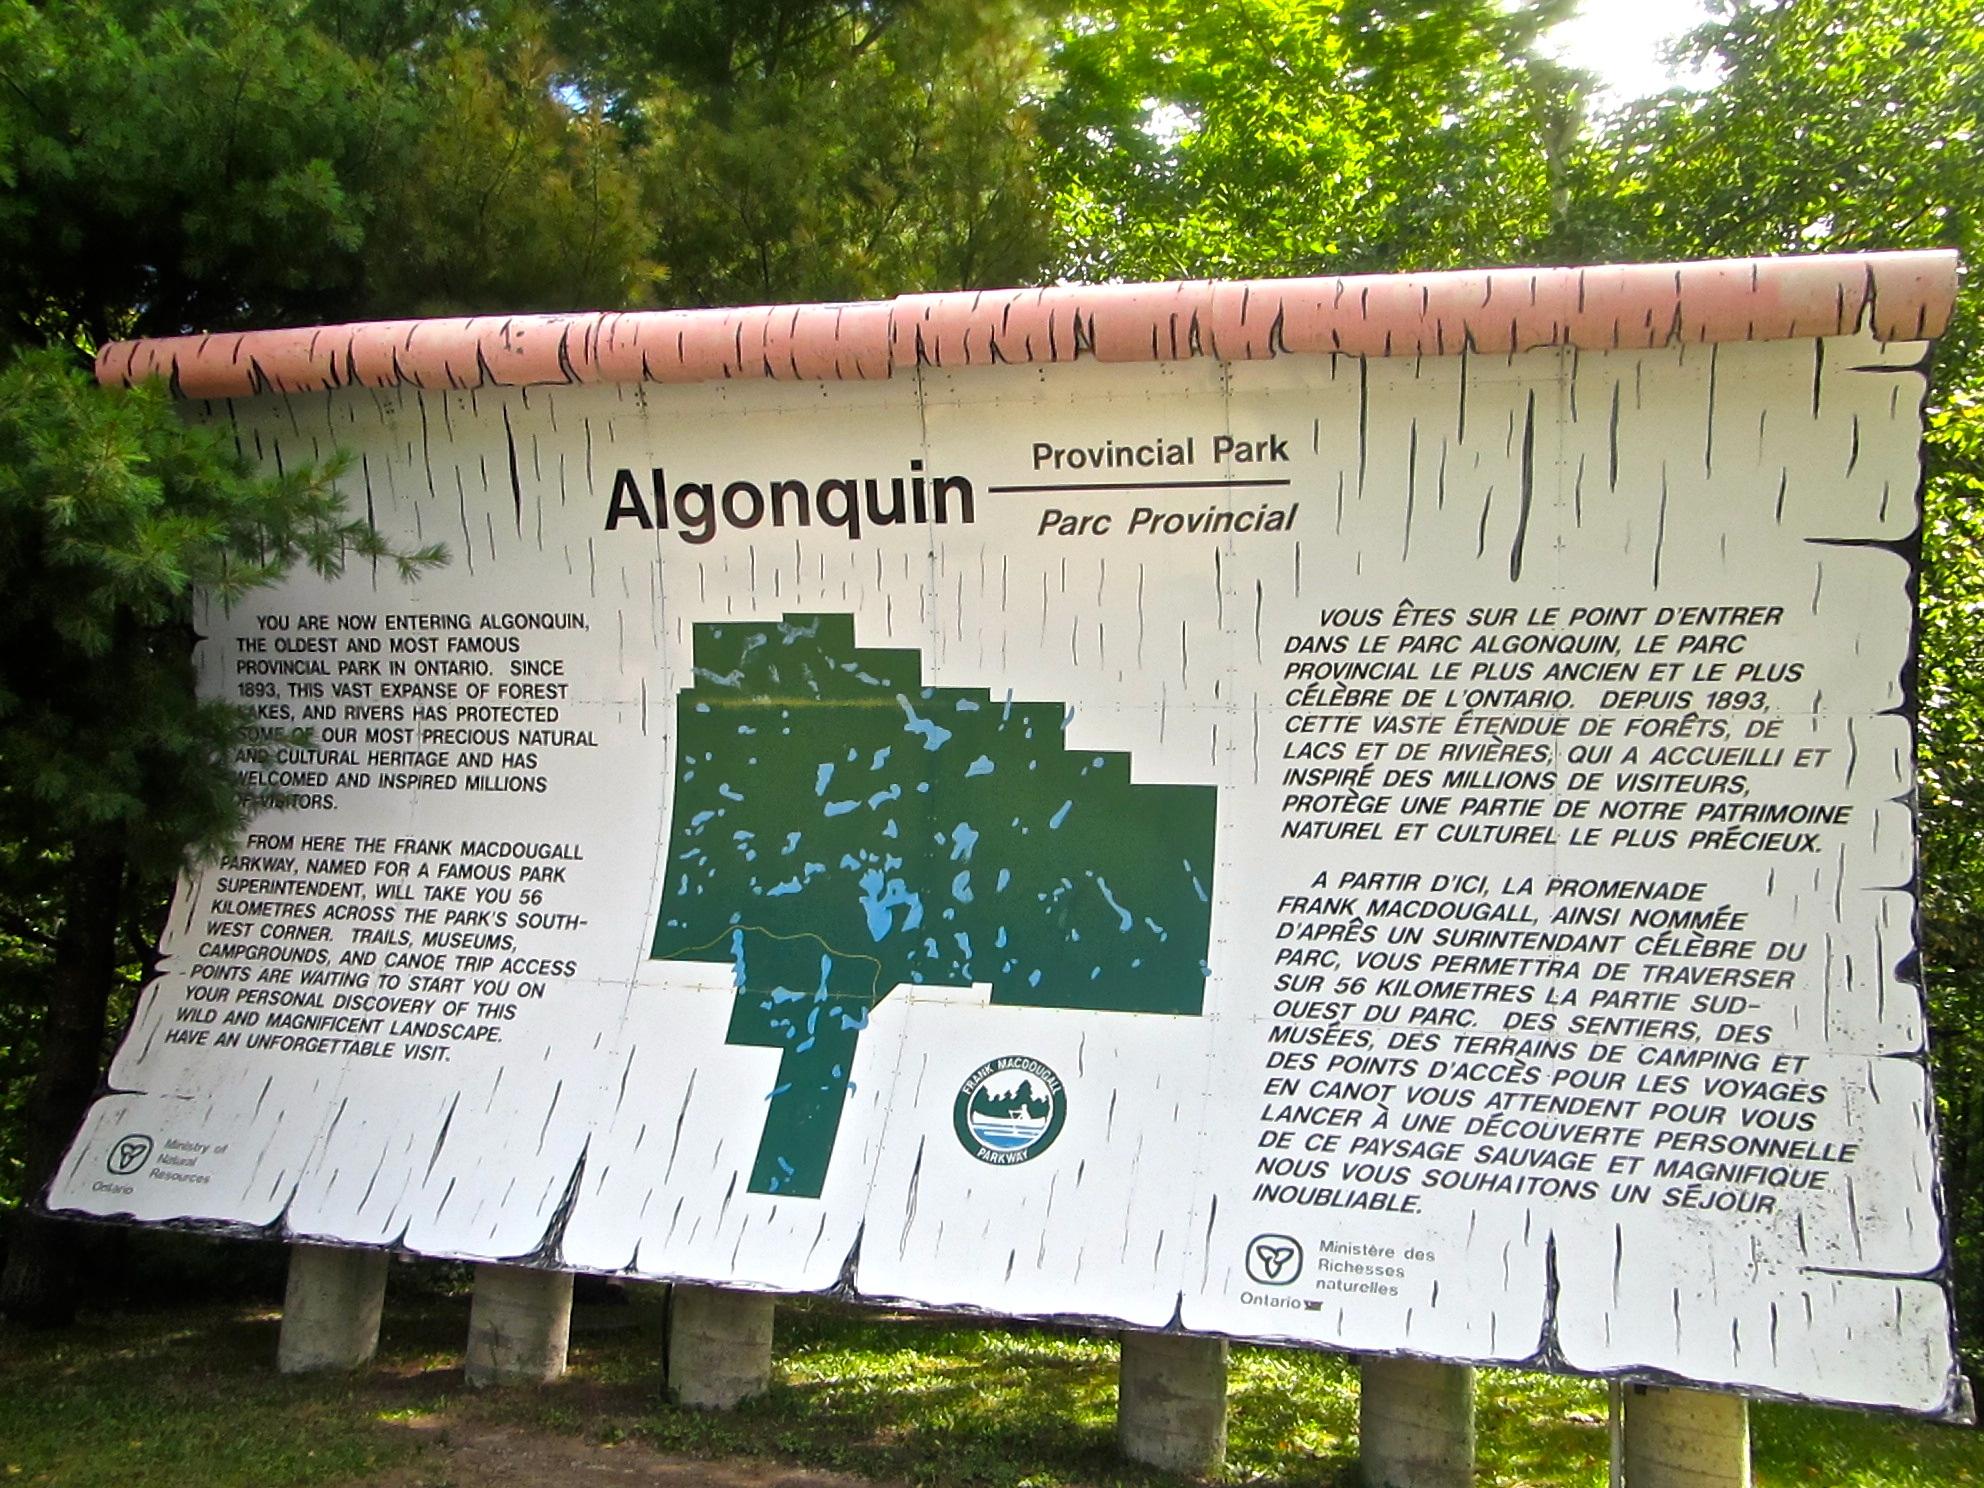 Picking up our park permit at westgate at Algonquin Provincial Park.